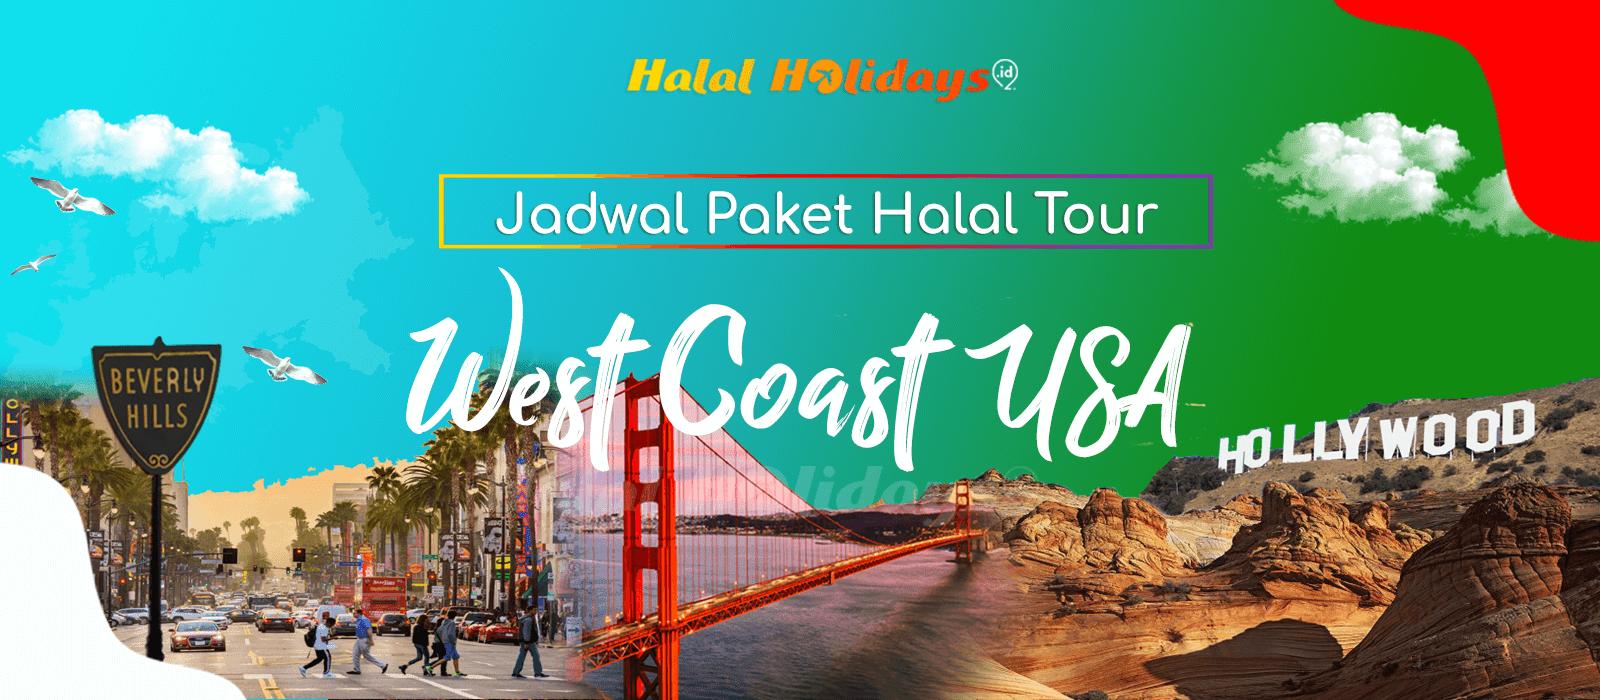 Paket Wisata Halal Tour Amerika West Coast USA Murah Tahun 2022 2023